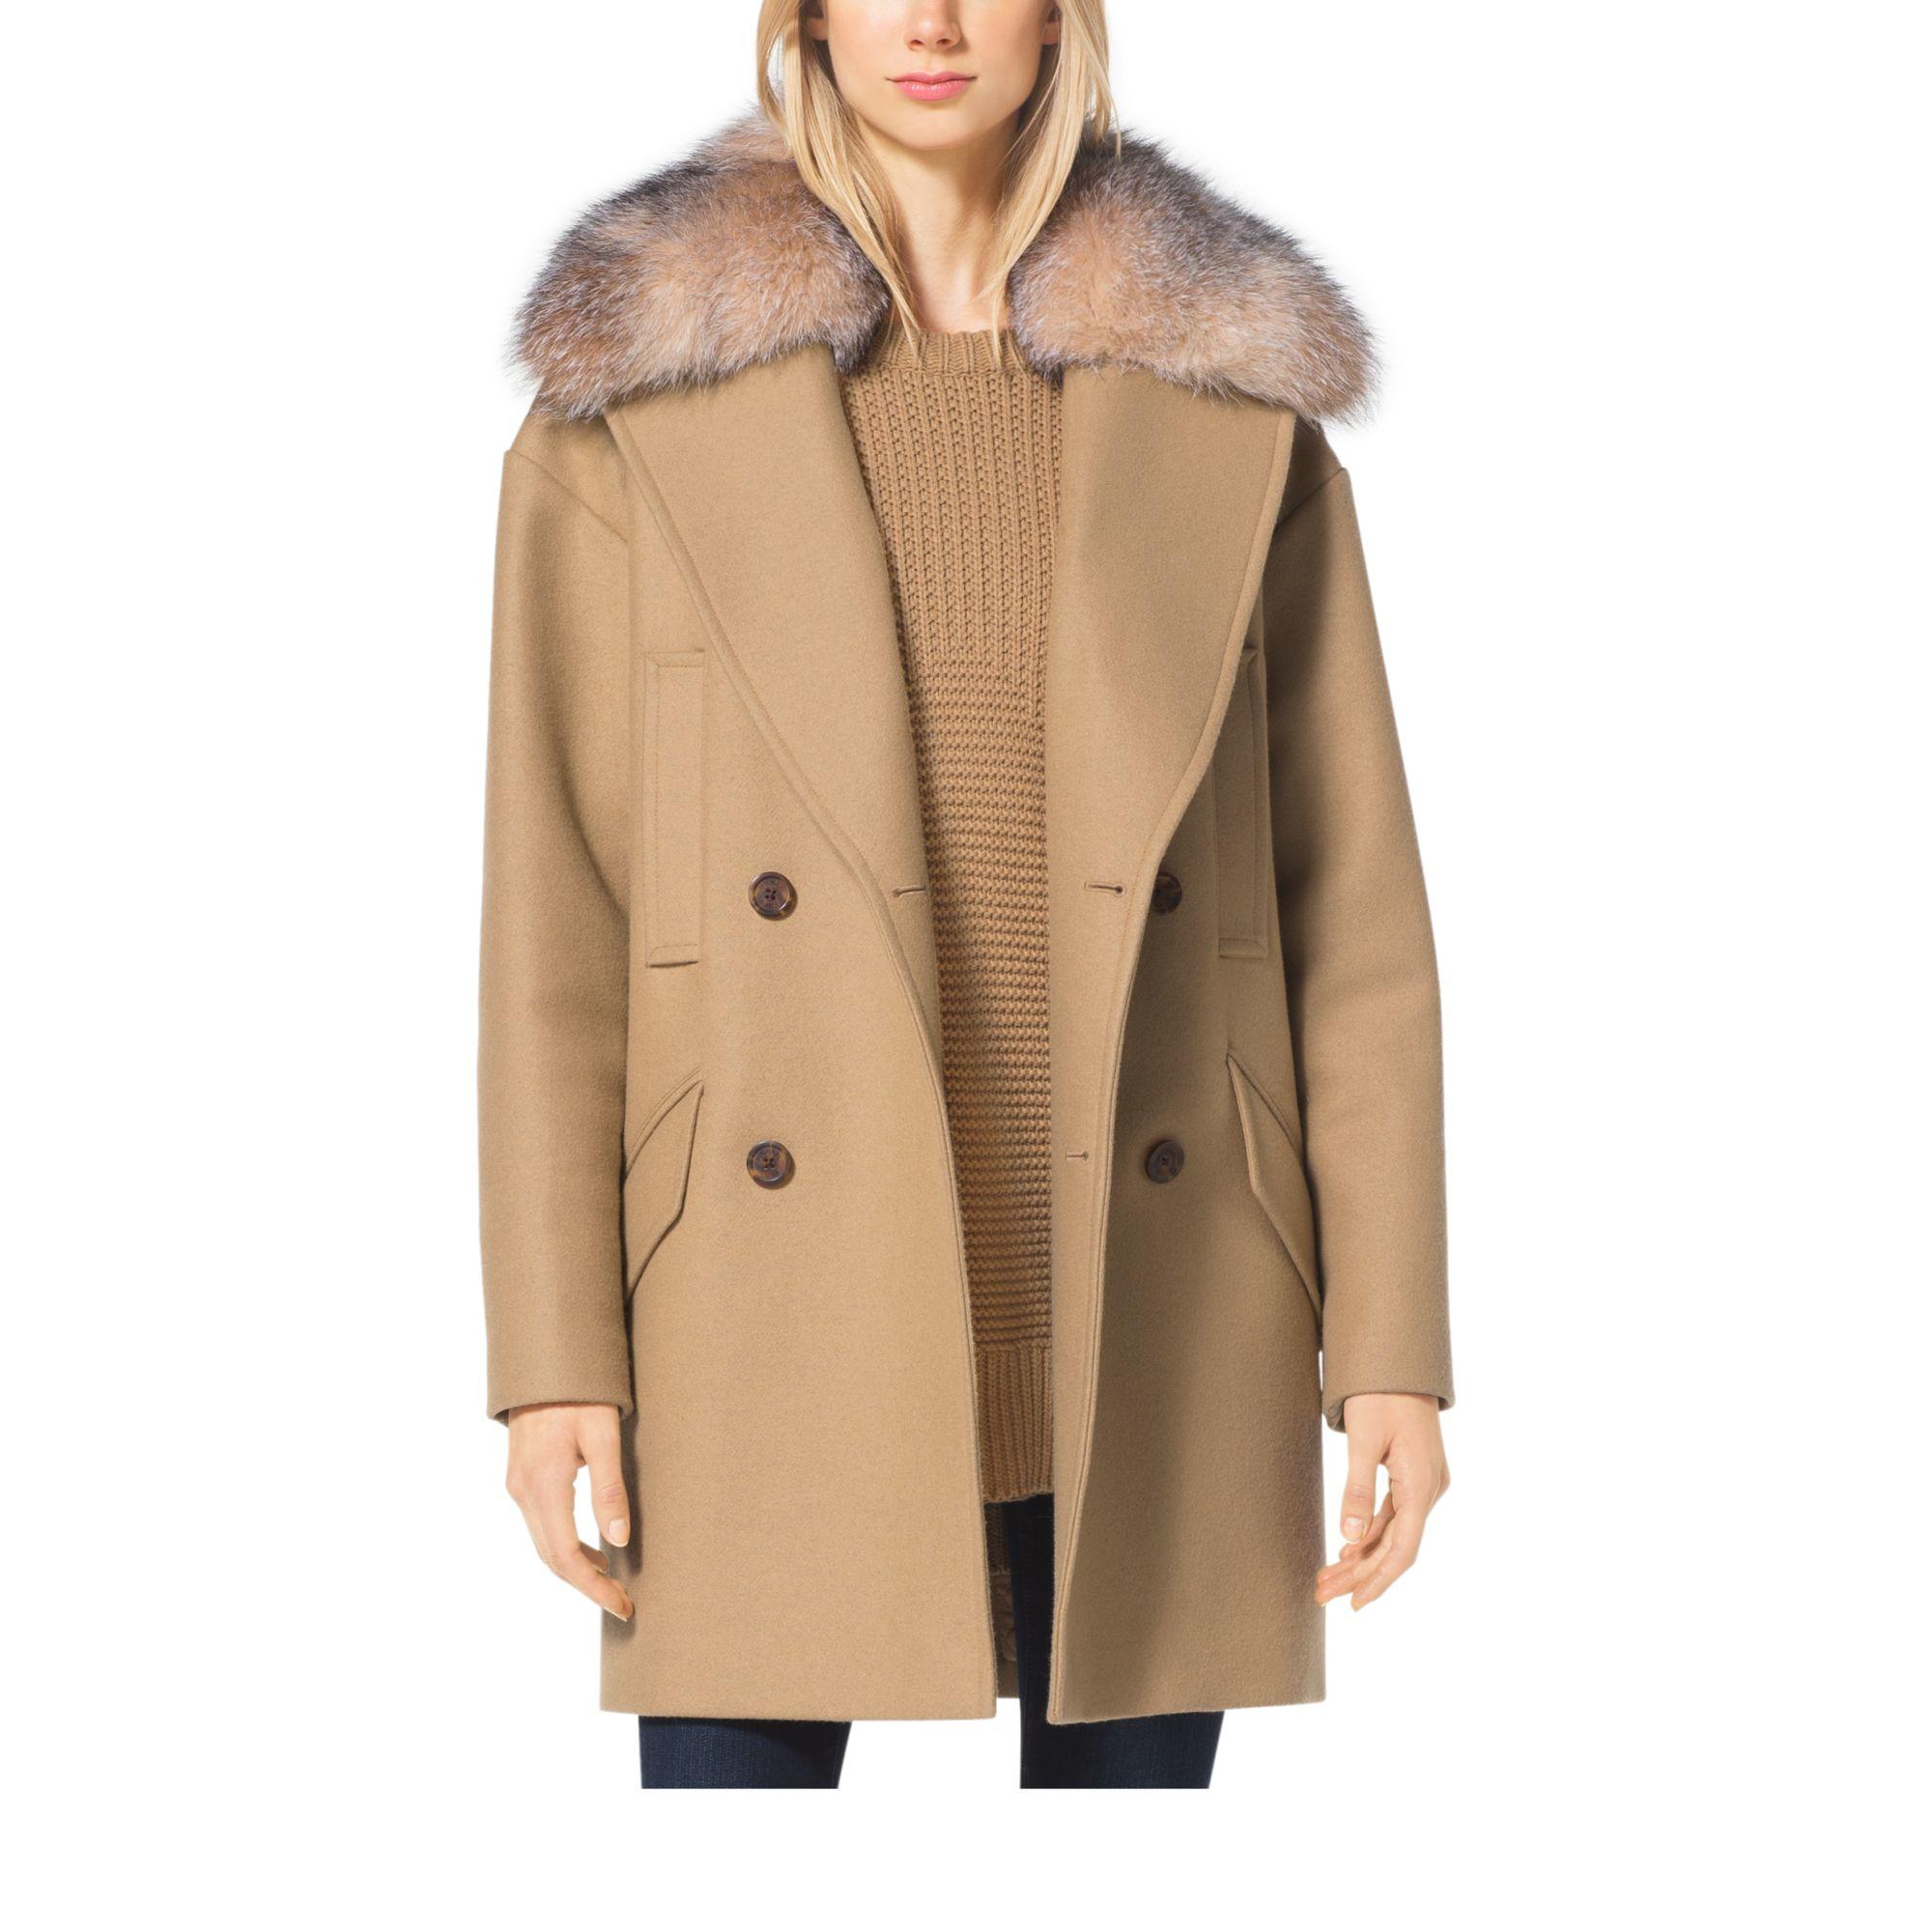 Michael kors Fur-trimmed Wool-melton Coat in Brown | Lyst